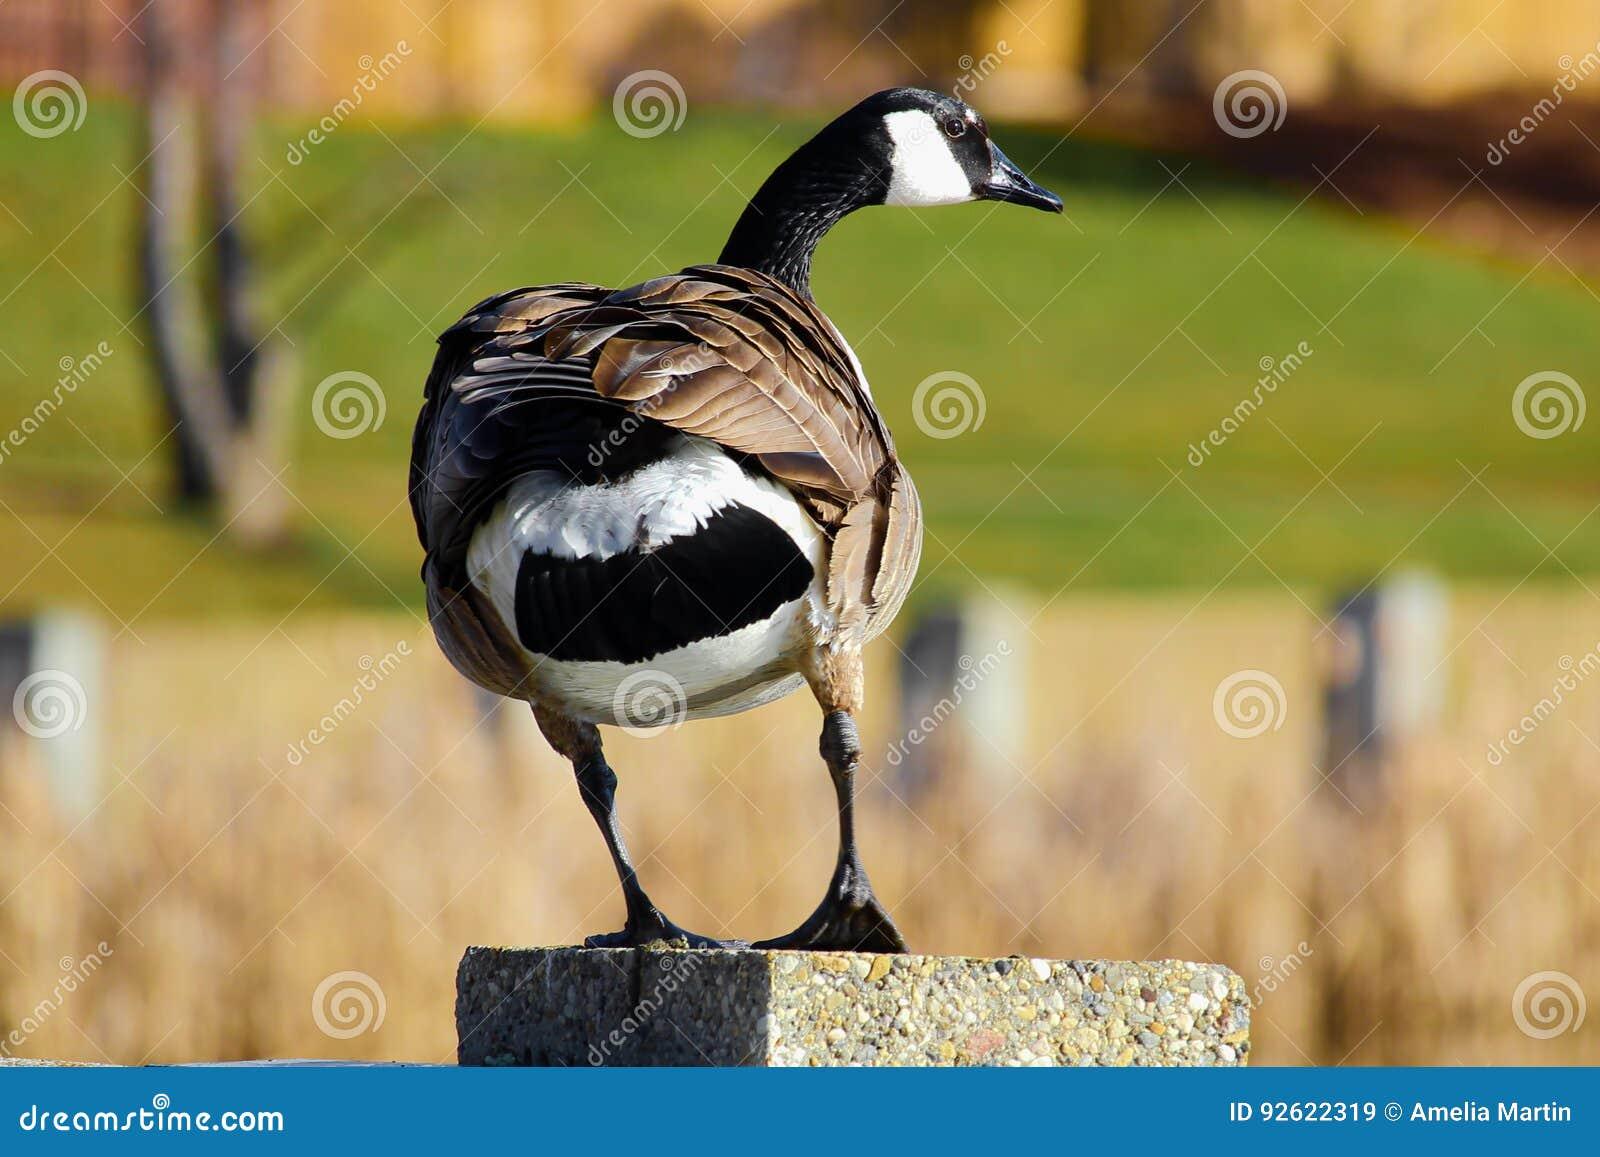 Canada Goose Hunting Pics Cartoon